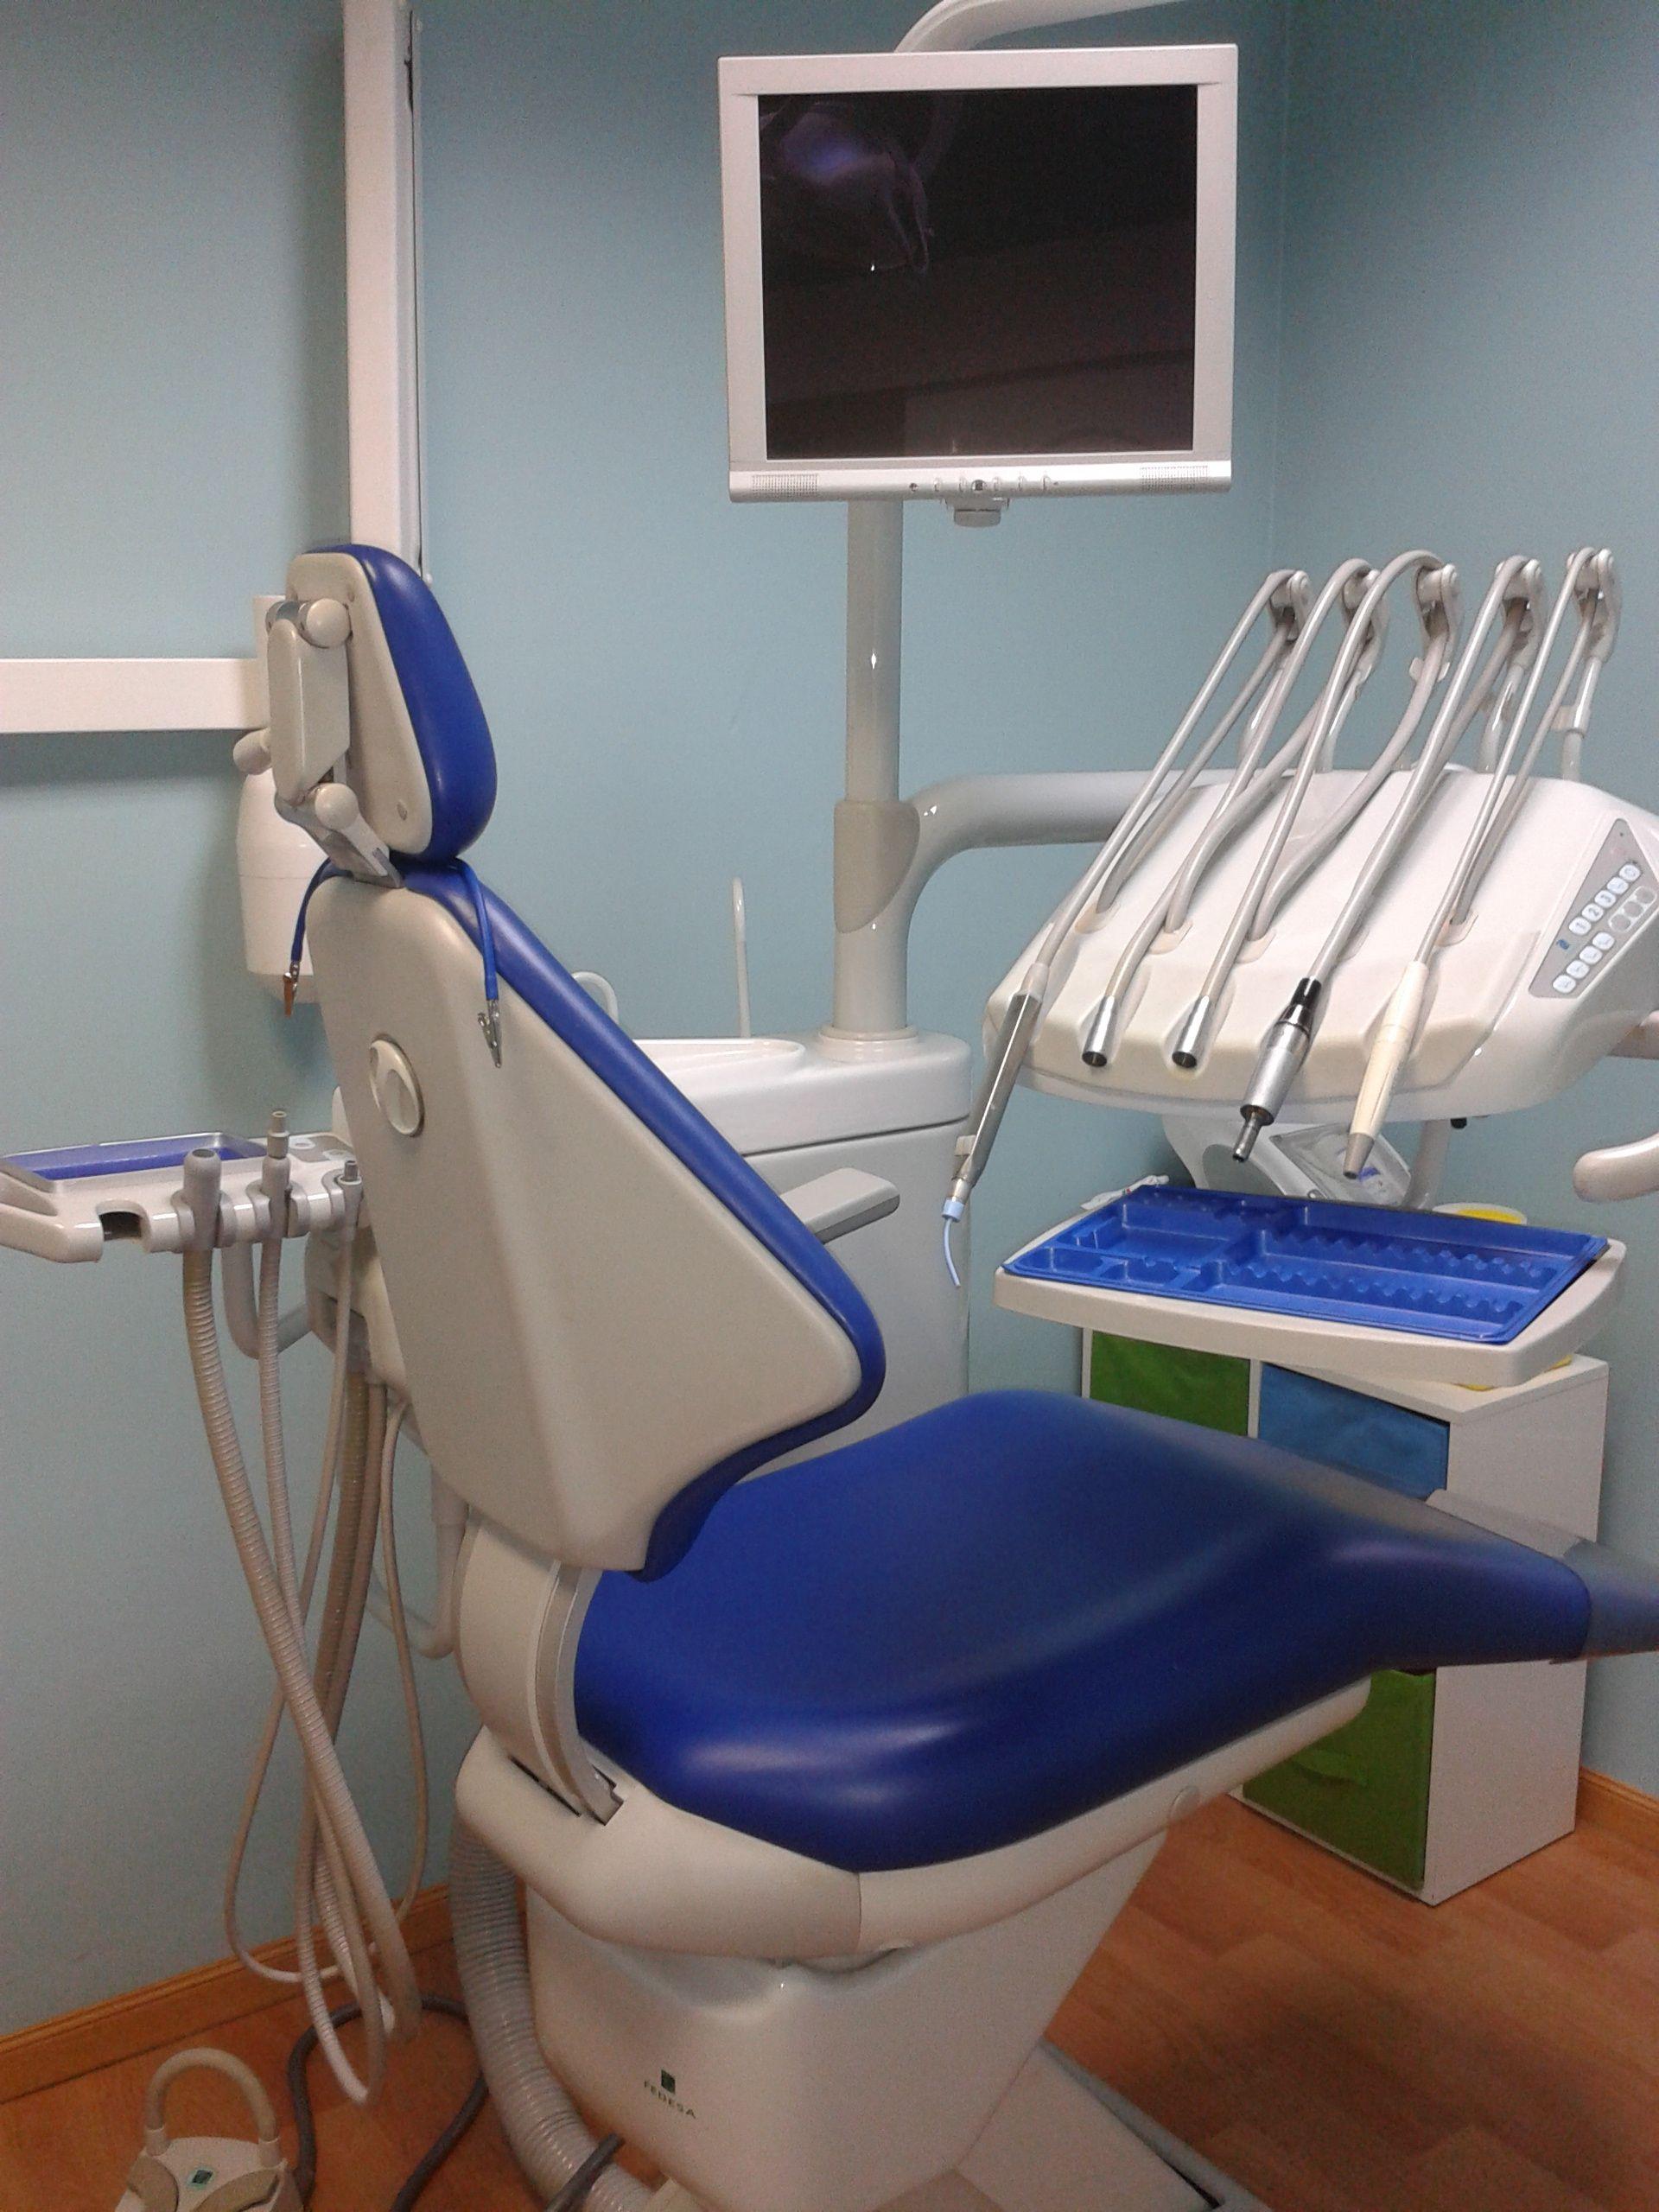 Foto 2 de Dentistas en Madrid | Clínica Dental Flordent